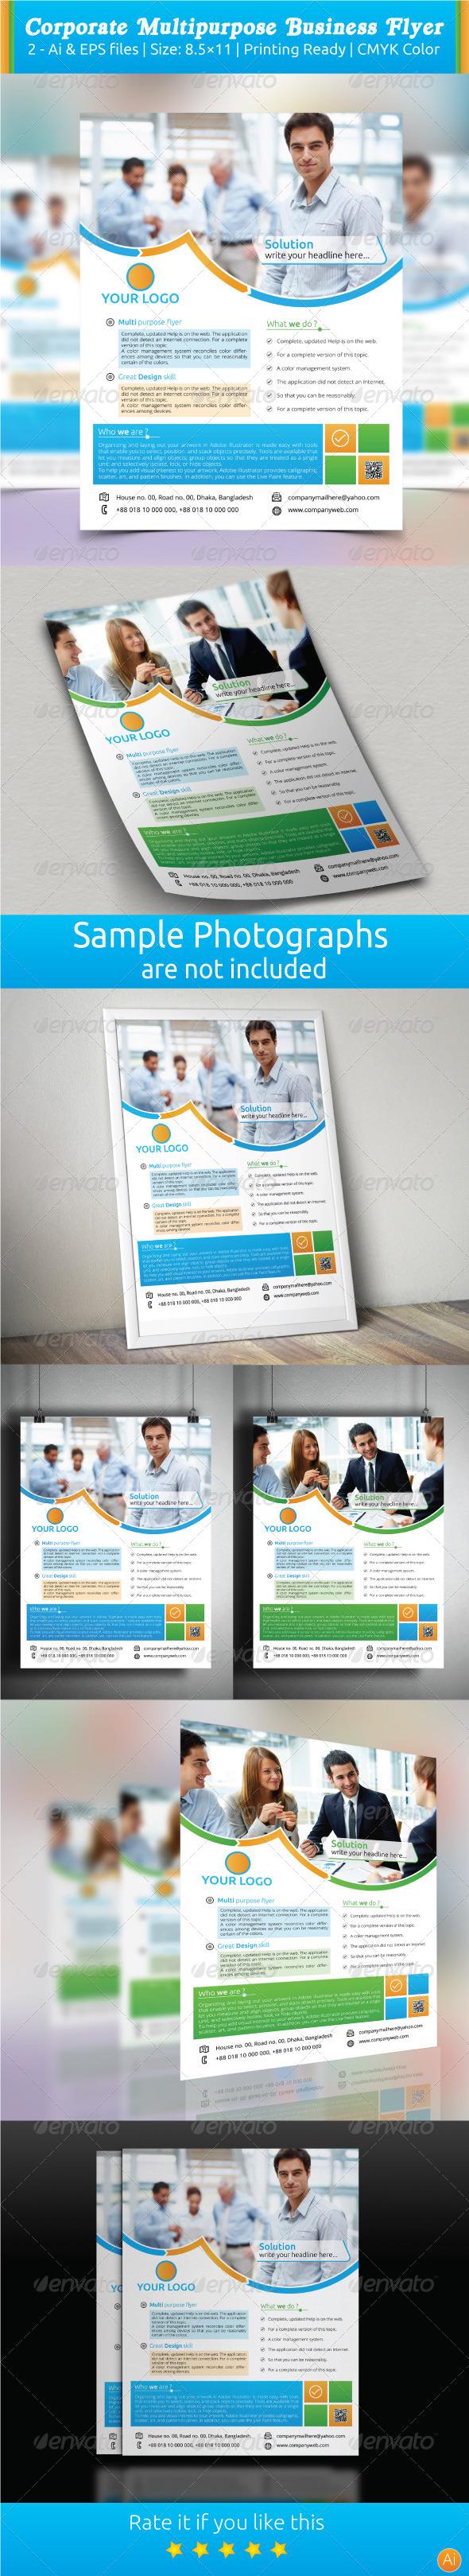 GraphicRiver Corporate Multipurpose Business Flyer 7667685